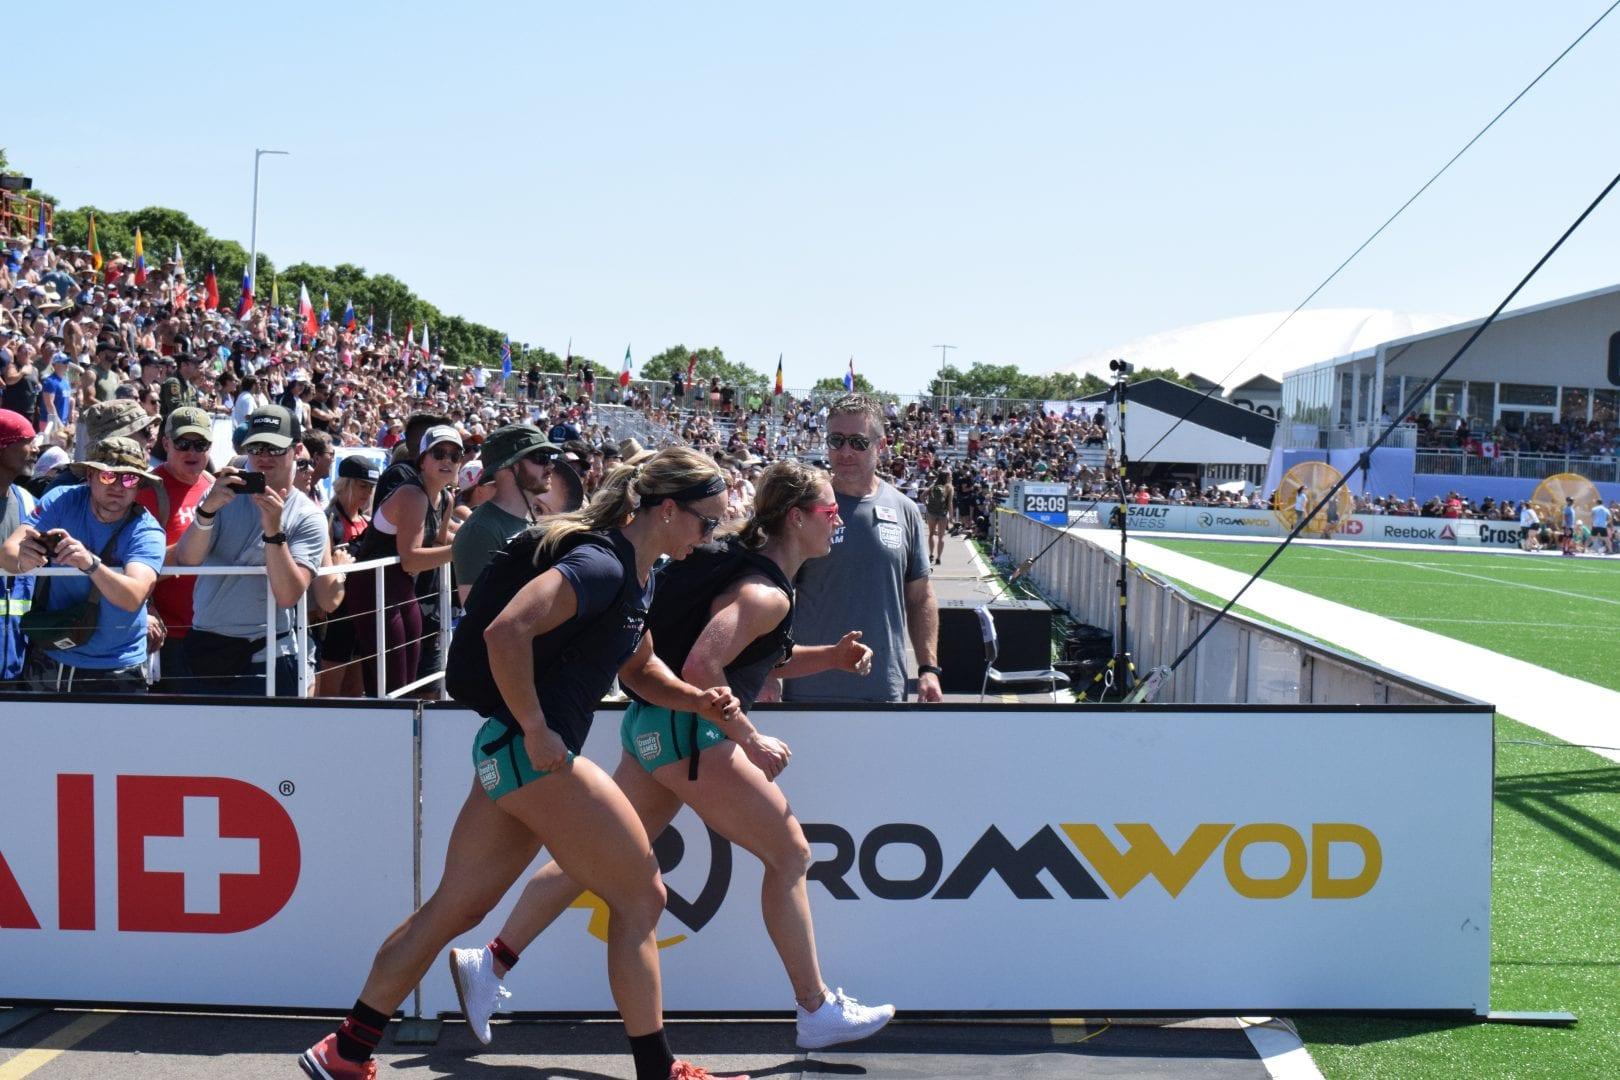 Amanda Barnhart completes the Ruck Run event at the 2019 CrossFit Games